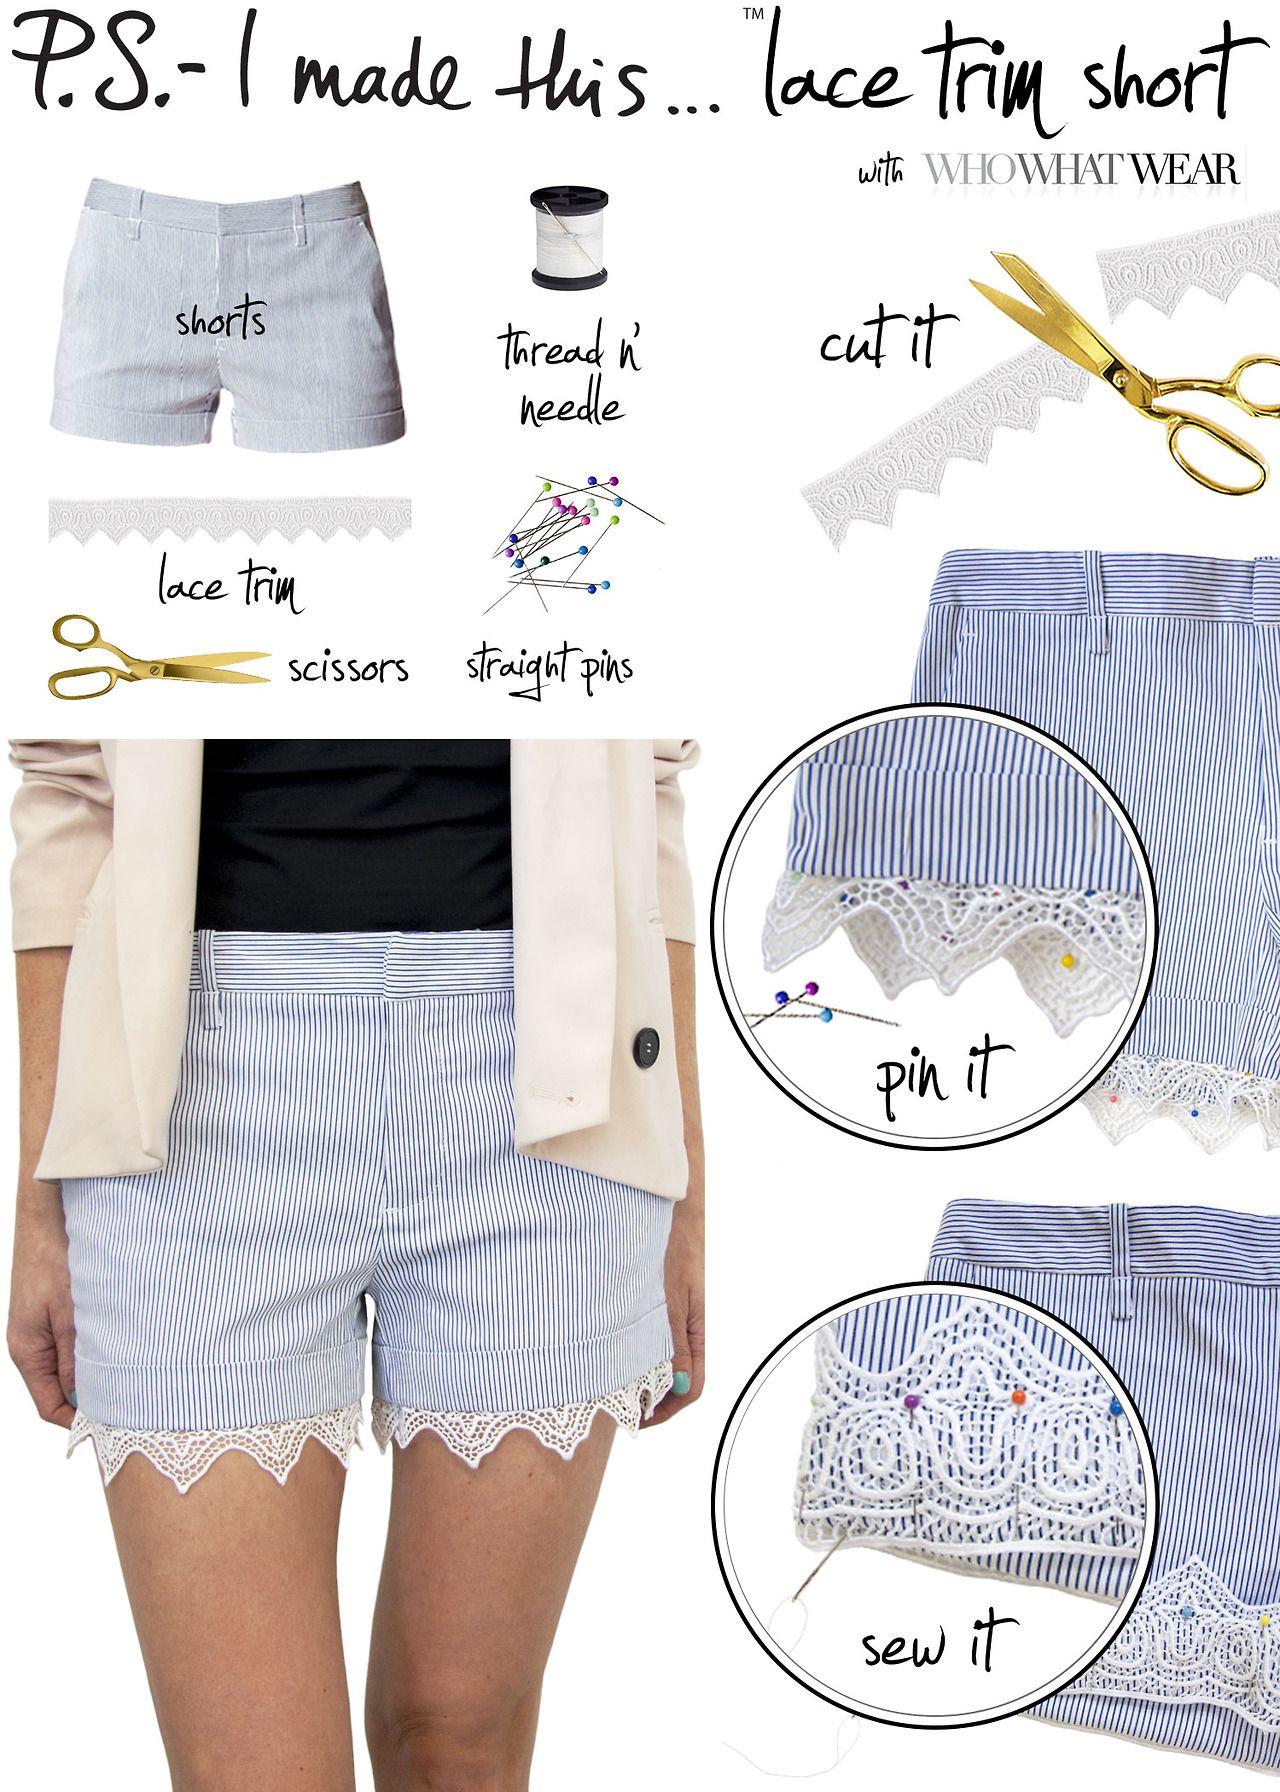 lace shorts | DIY Stuff | Pinterest | Costura, Cambio y Femenino